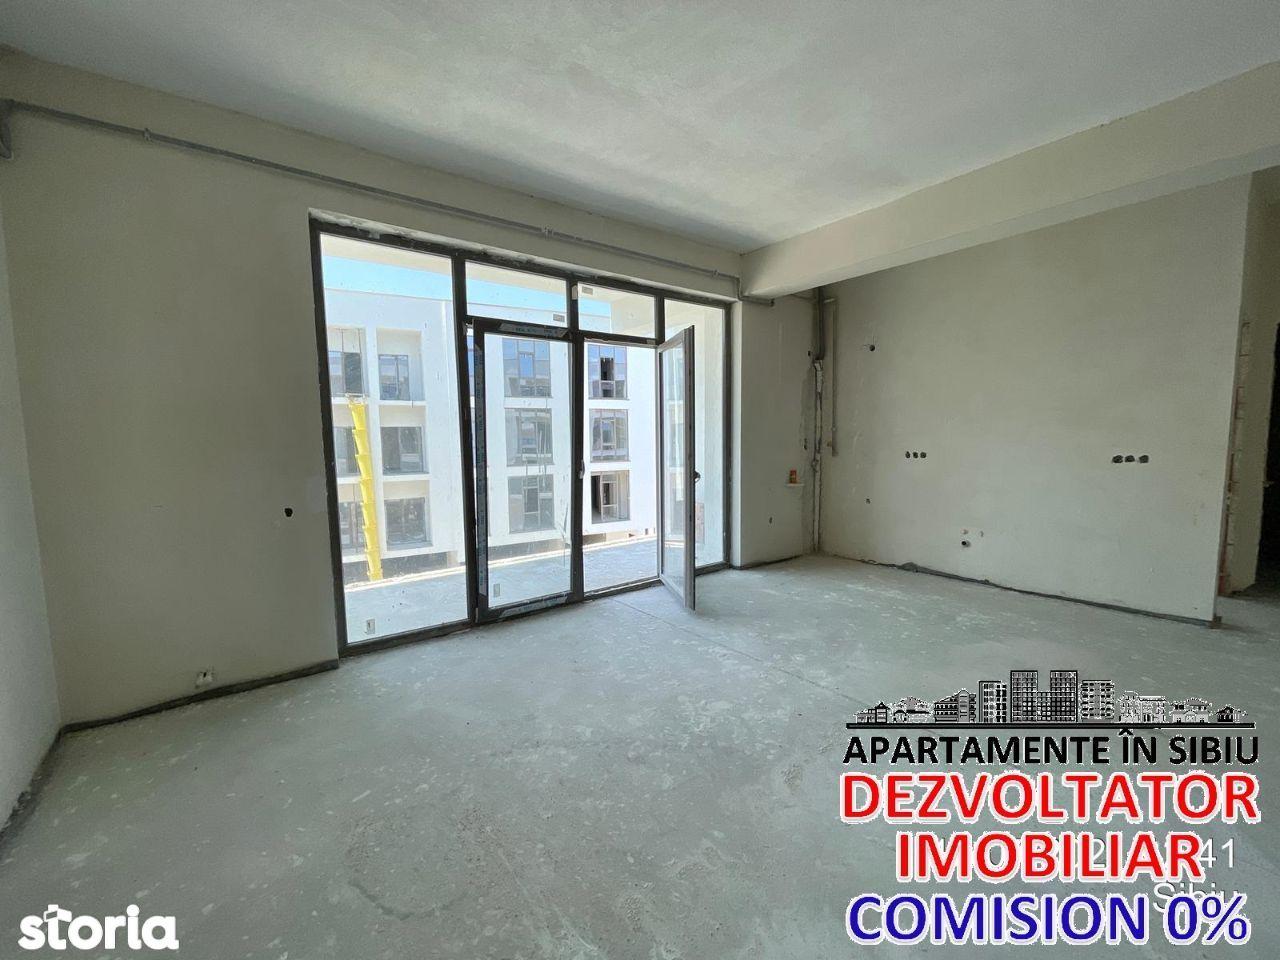 Oferta Reala: 747 euro/mpc. Apartament 3 camere cu toate utilitatile.